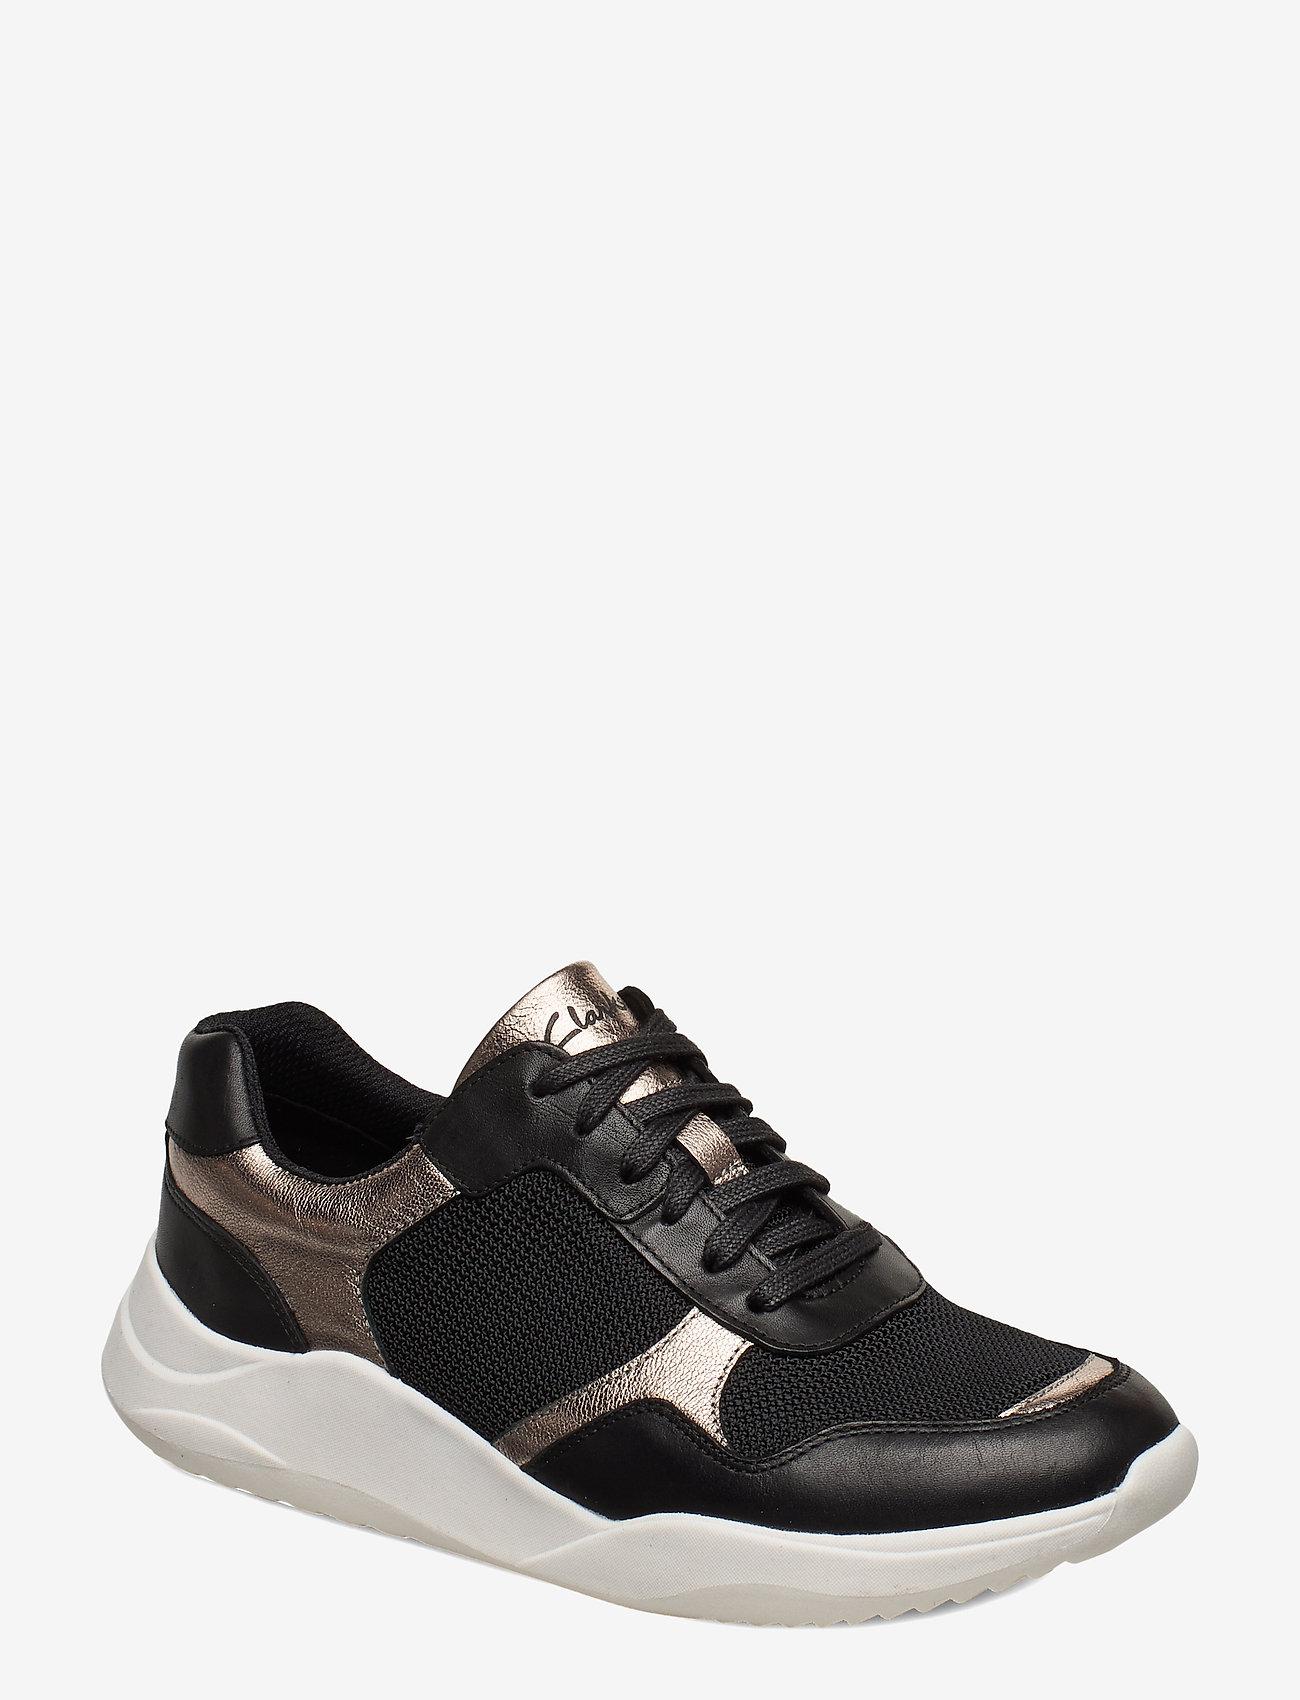 Clarks - Sift Lace - sneakers med lav ankel - black combi - 0